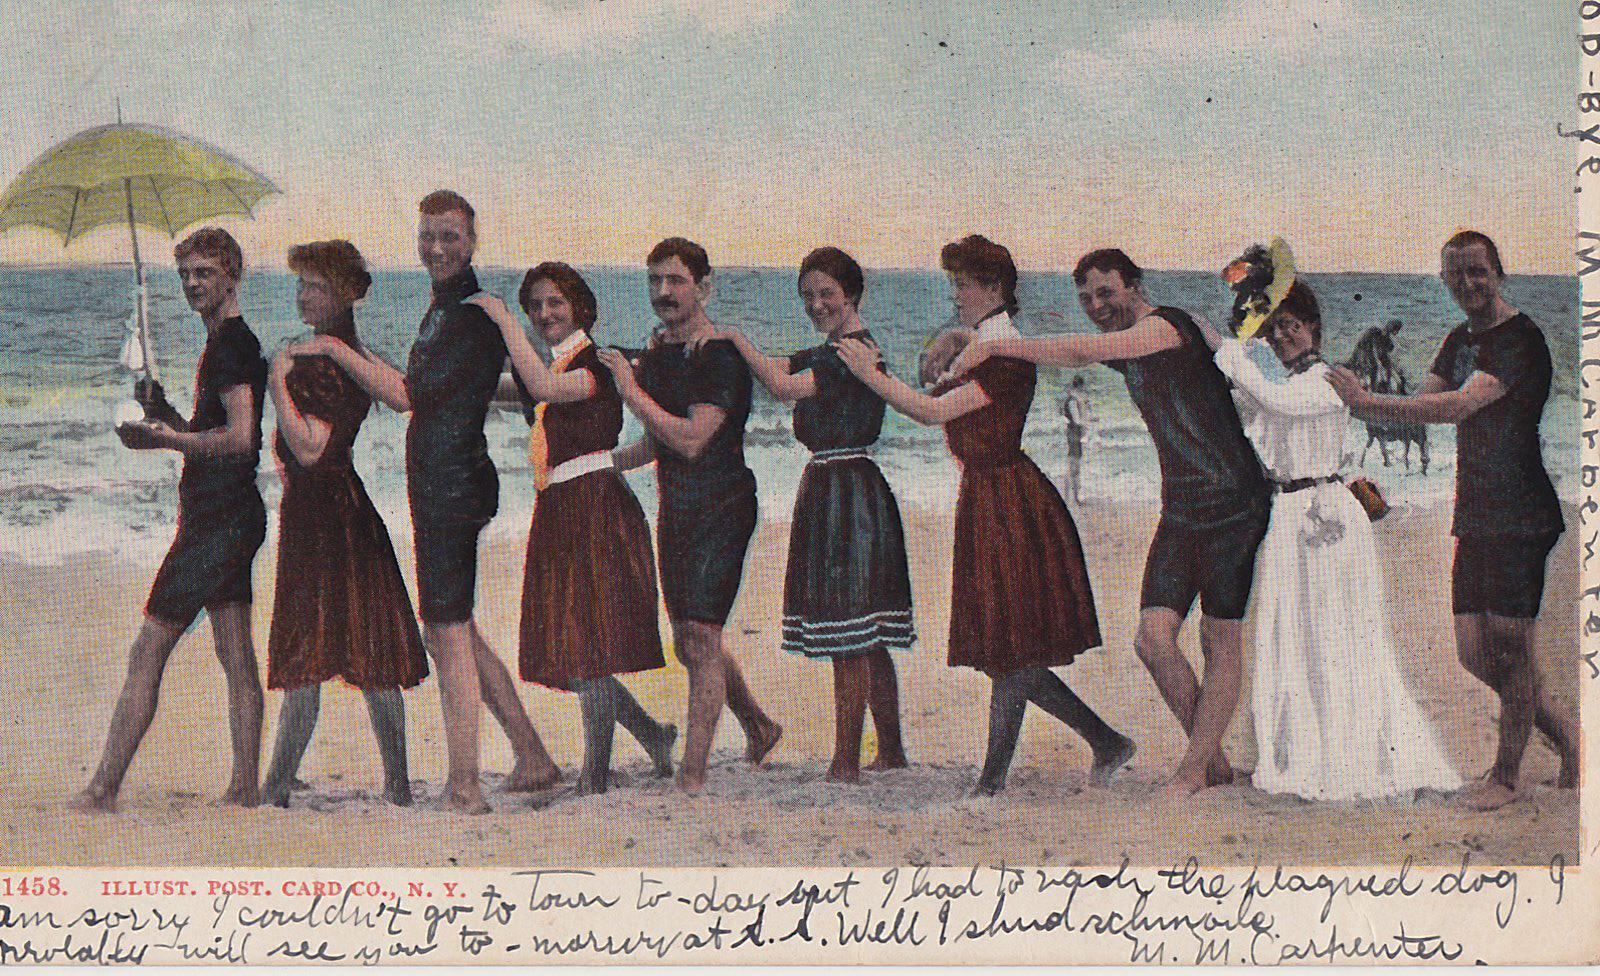 Roton Point Bathers postcard 1906 70.36.103 (2)